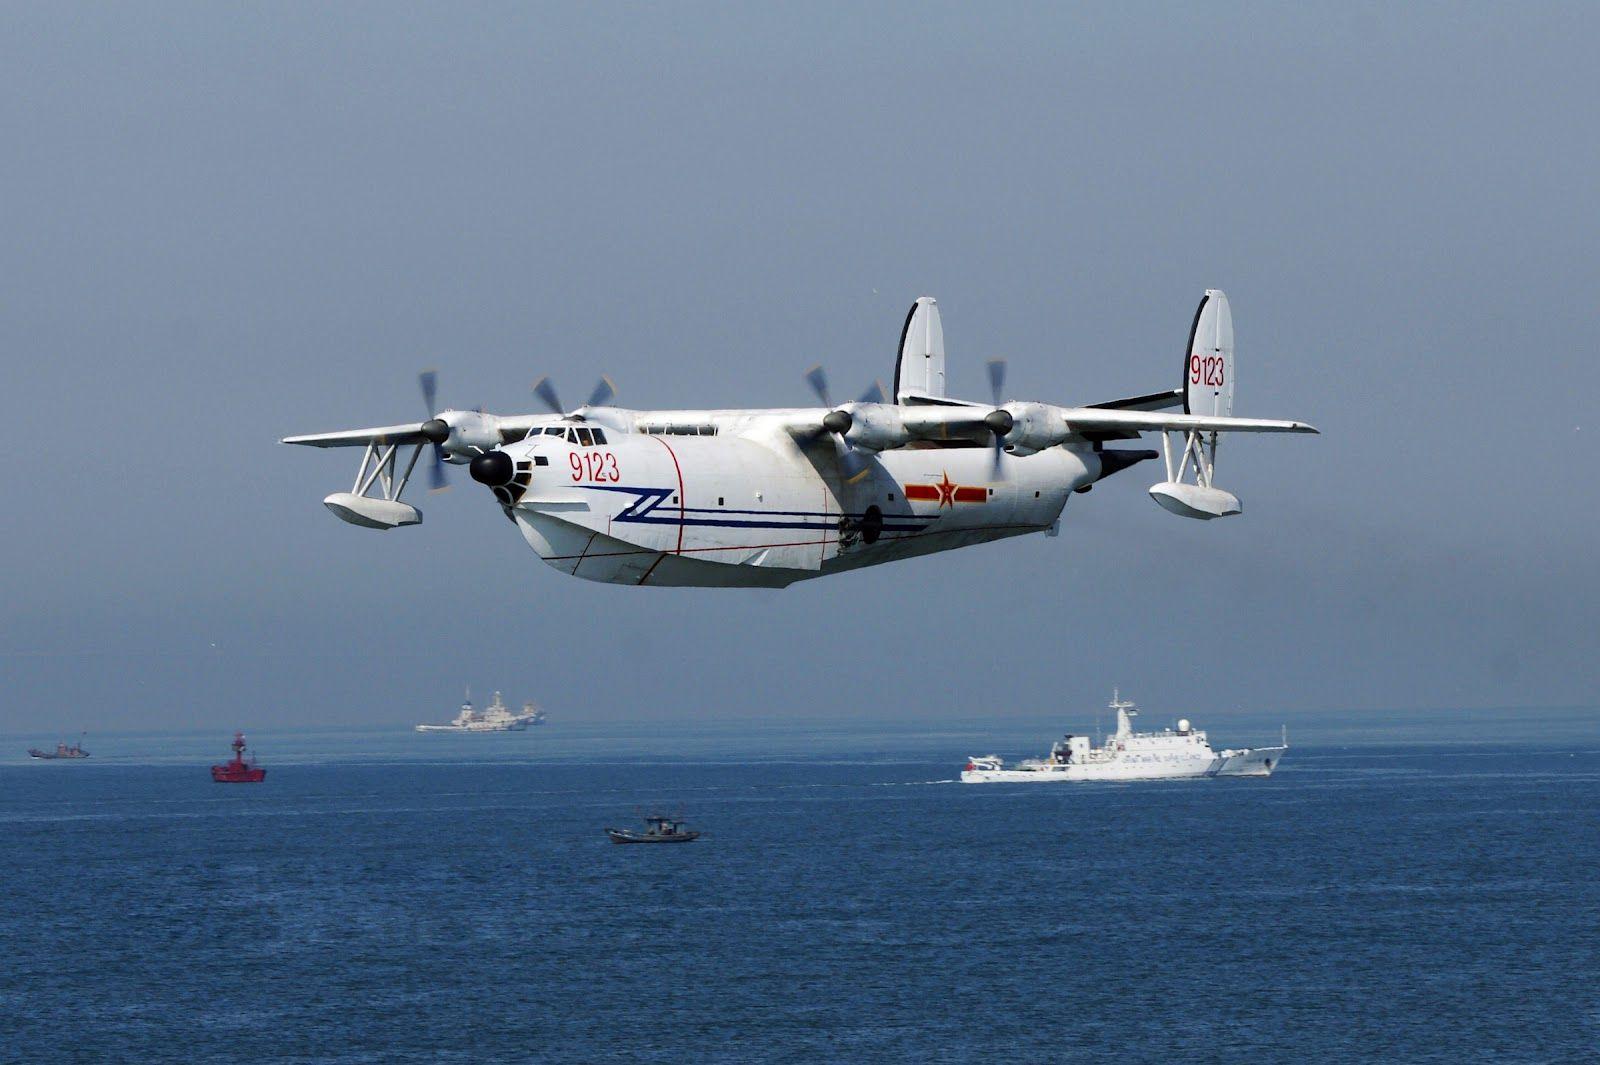 Chinese SH5 Maritime Patrol Aircraft / Amphibious